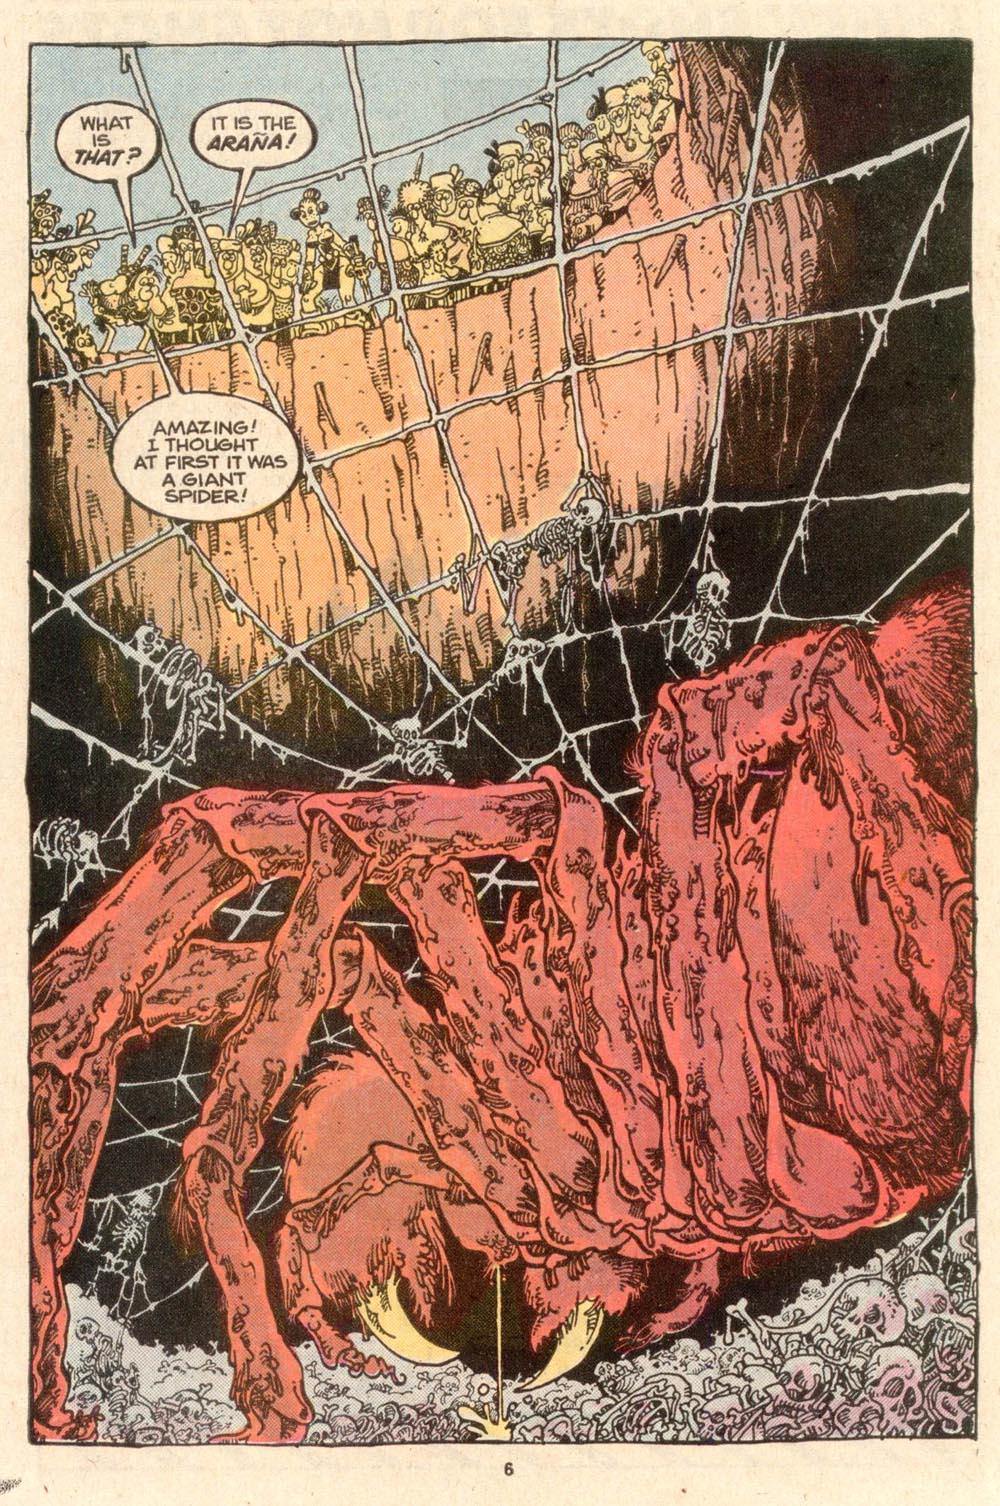 Read online Sergio Aragonés Groo the Wanderer comic -  Issue #52 - 6